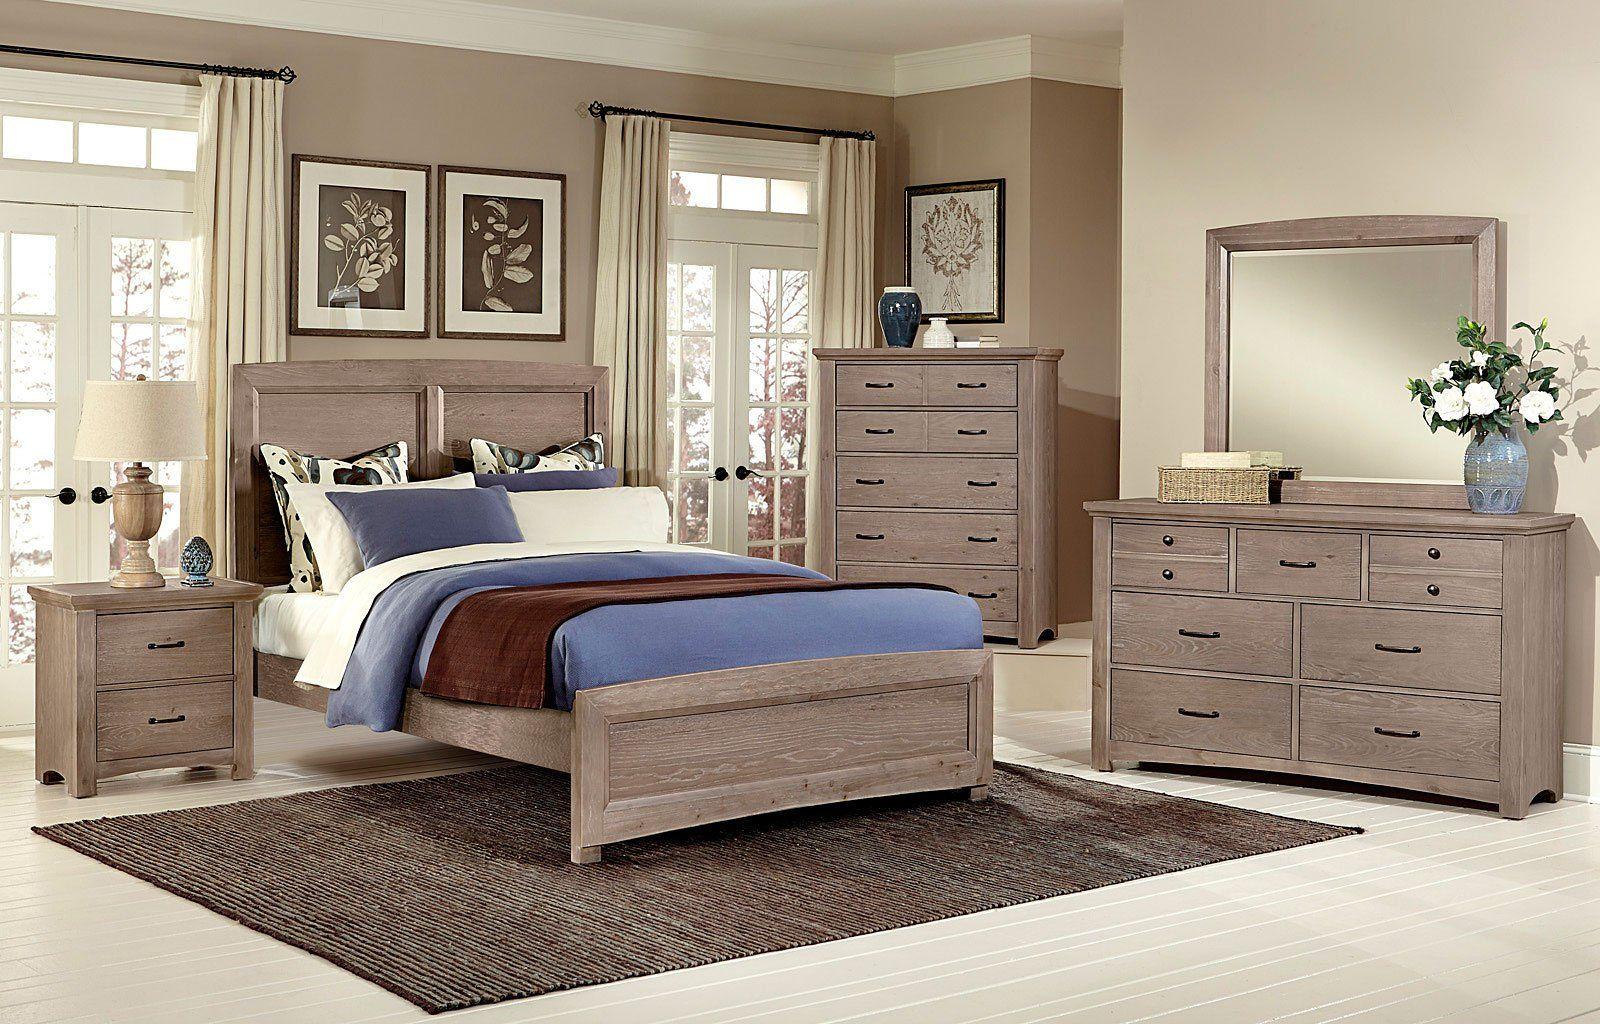 Transitions Panel Bedroom Set (Driftwood Oak) King